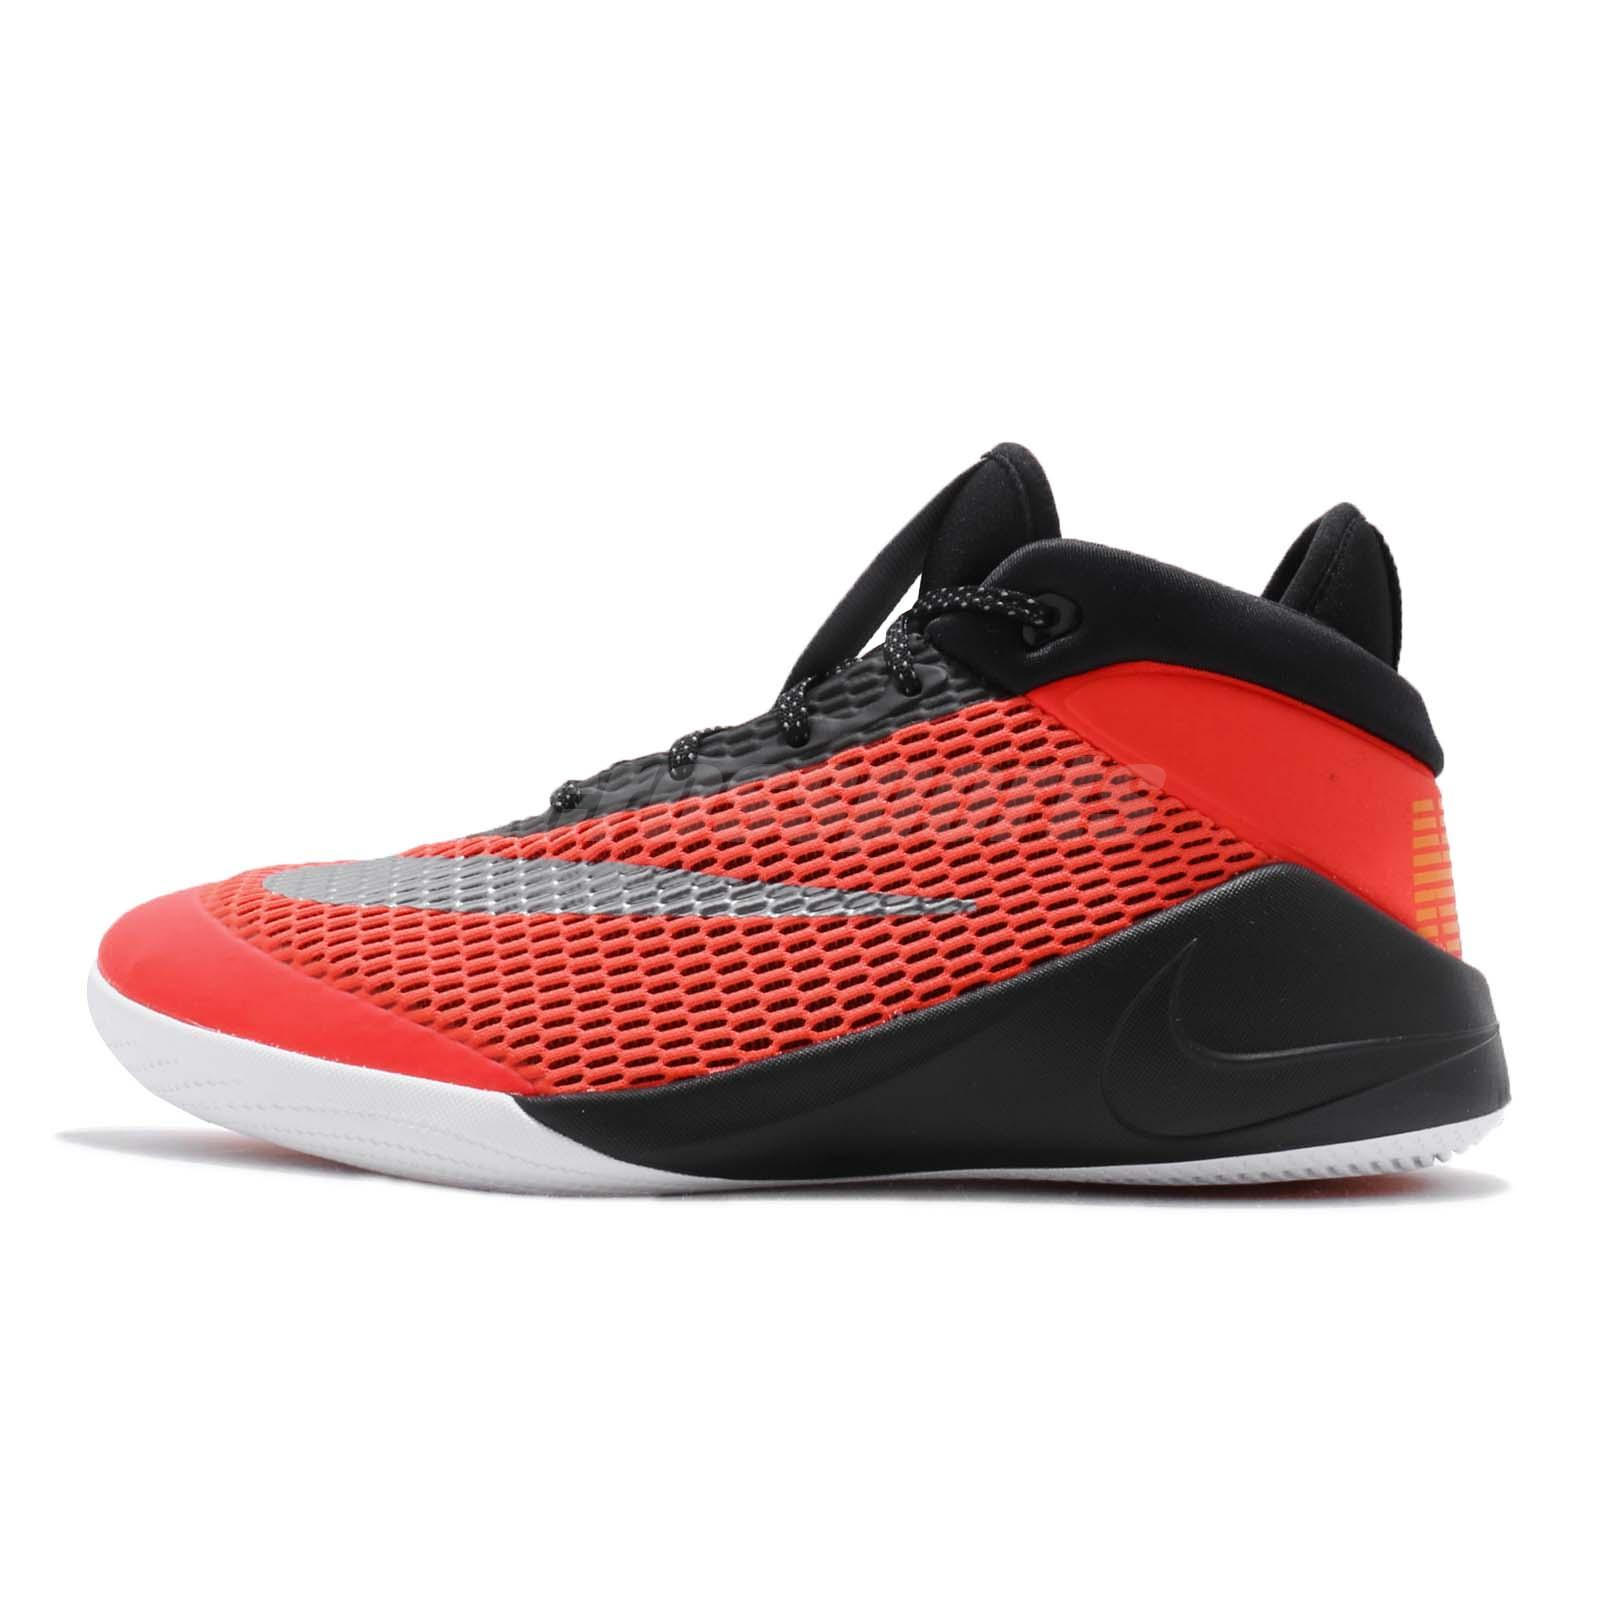 8a269369639381 Details about Nike Future Flight GS Bright Crimson Black Kid Youth Women  Basketball AH3430-600